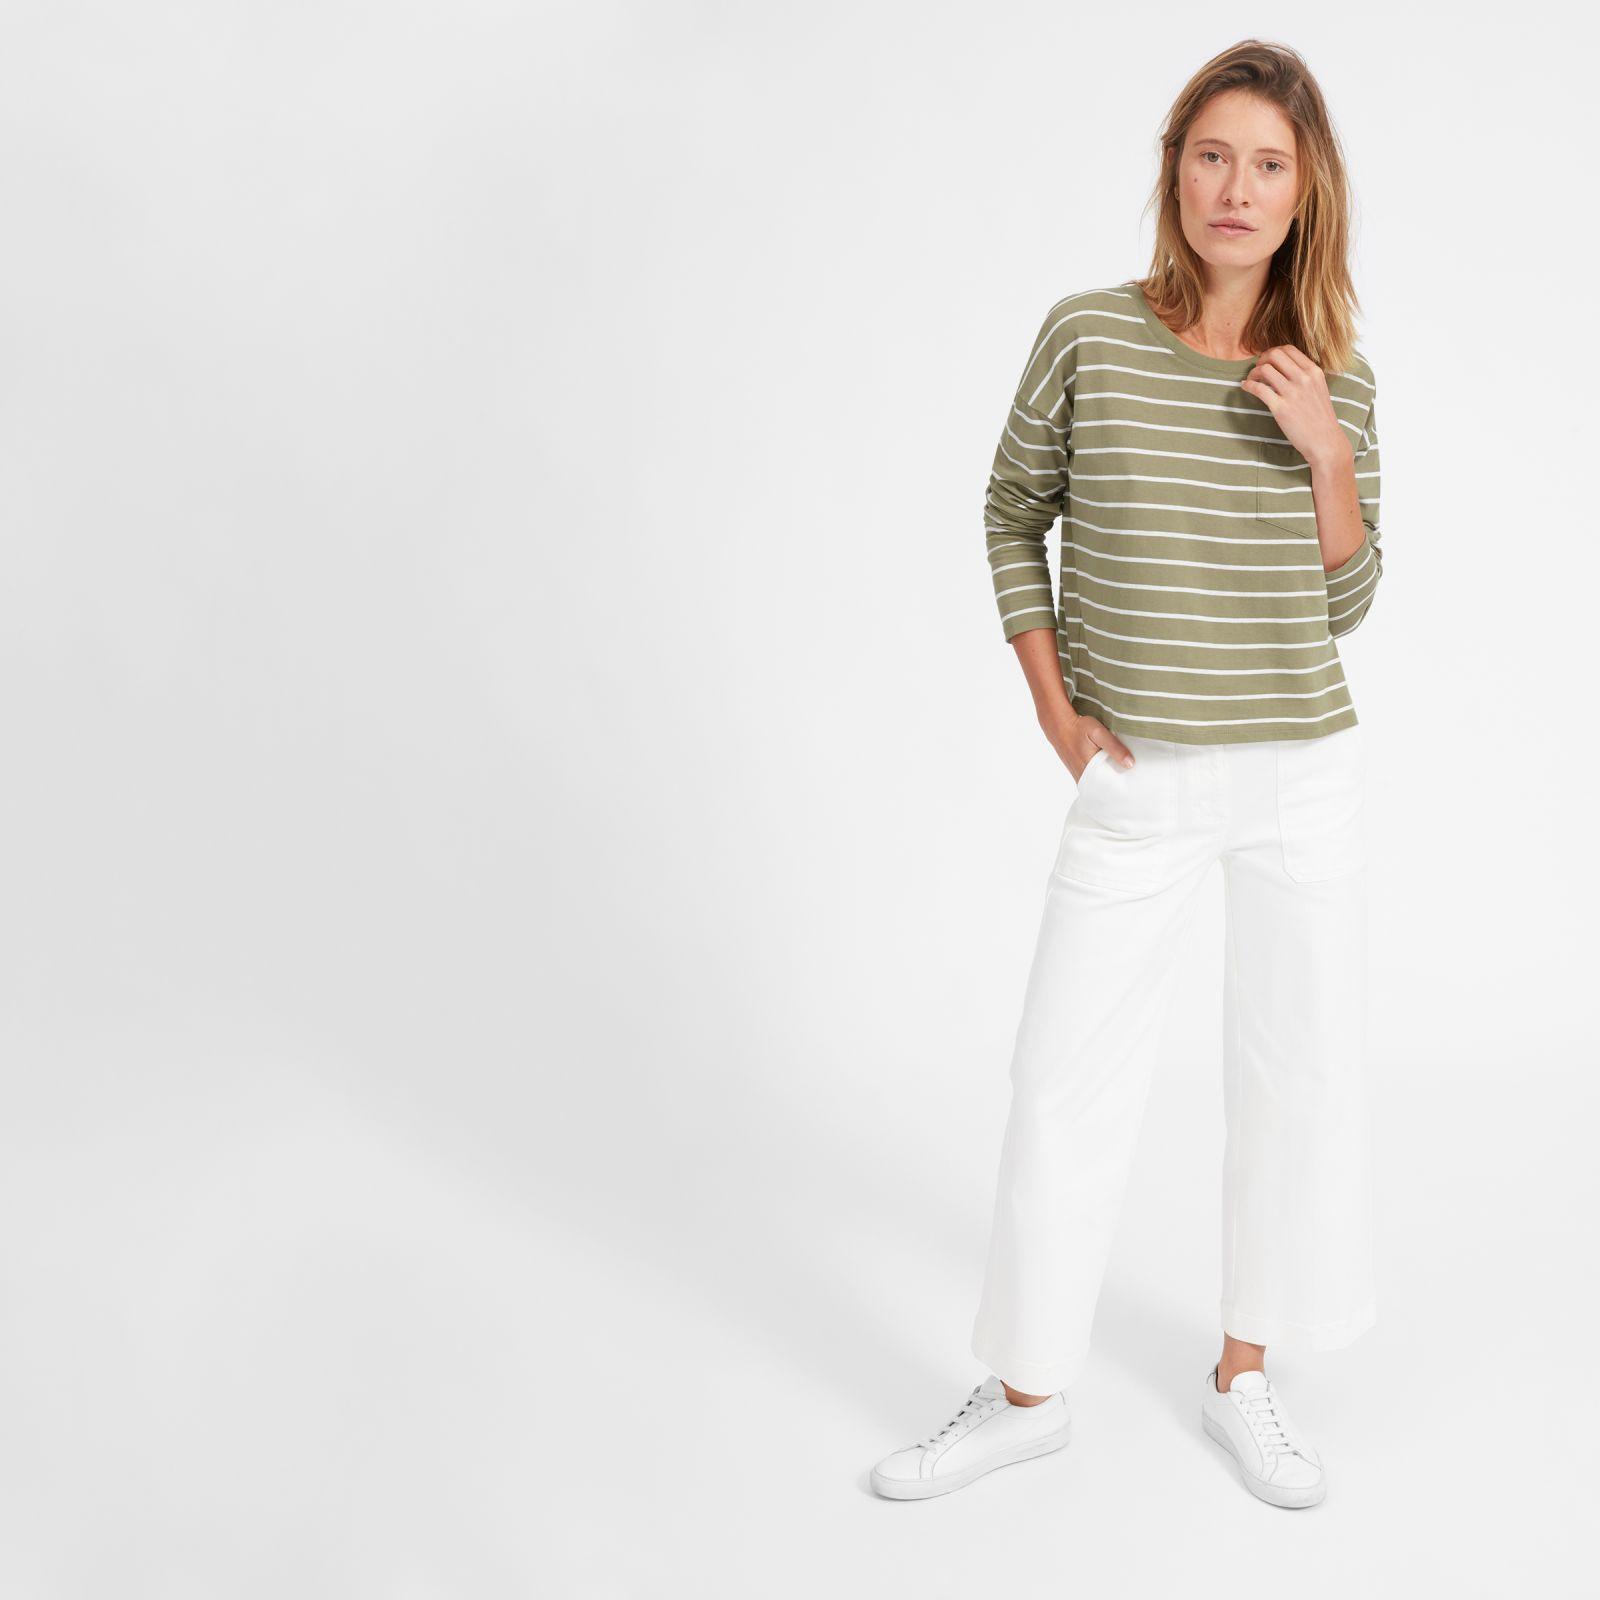 women's long-sleeve box-cut pocket t-shirt by everlane in covert green / white, size xxs